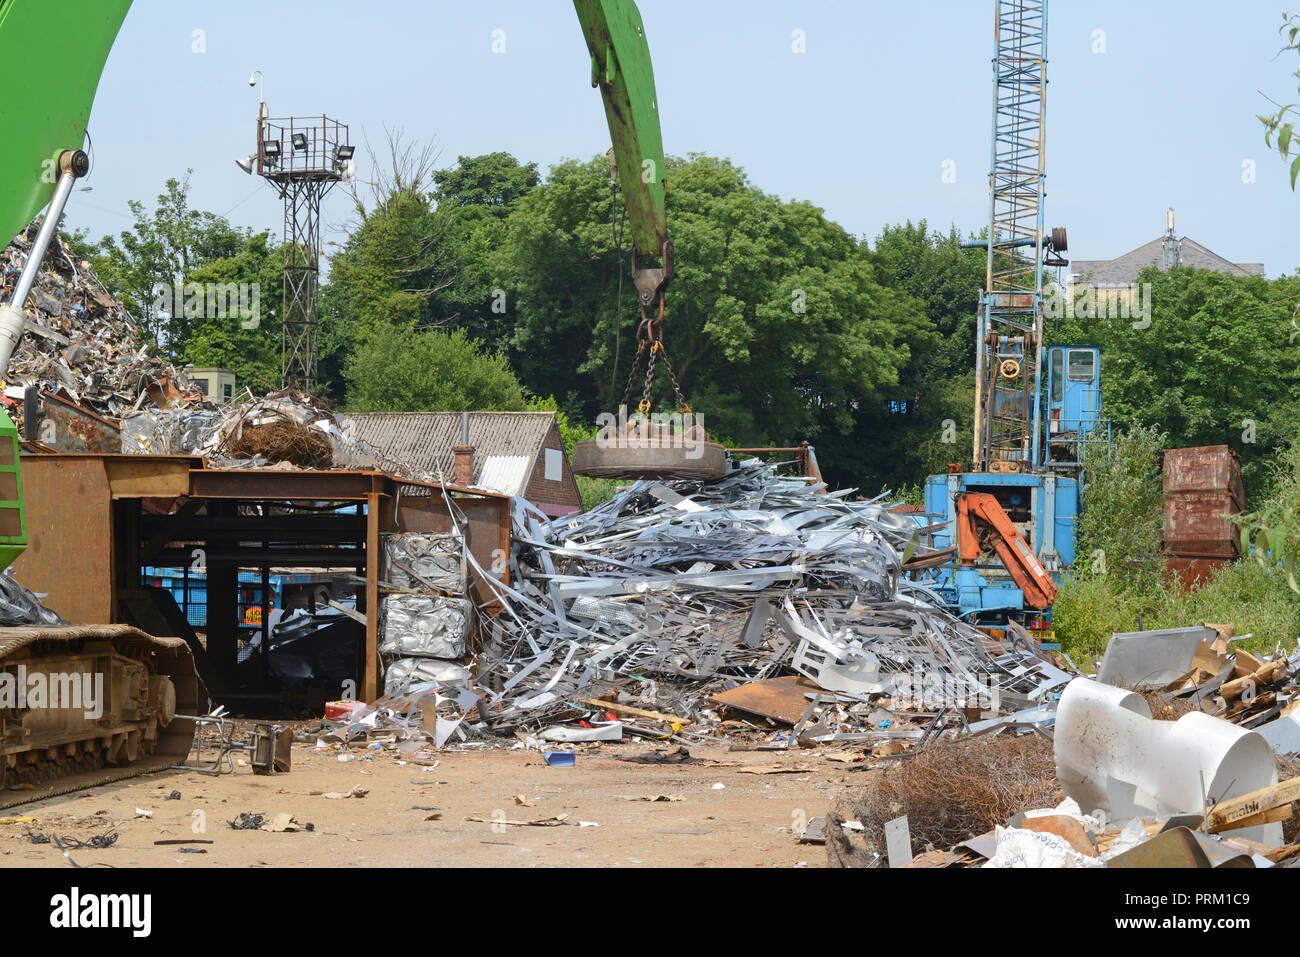 electomagnetic on crane sorting through scrap metal at scrapyard leeds yorkshire united kingdom - Stock Image